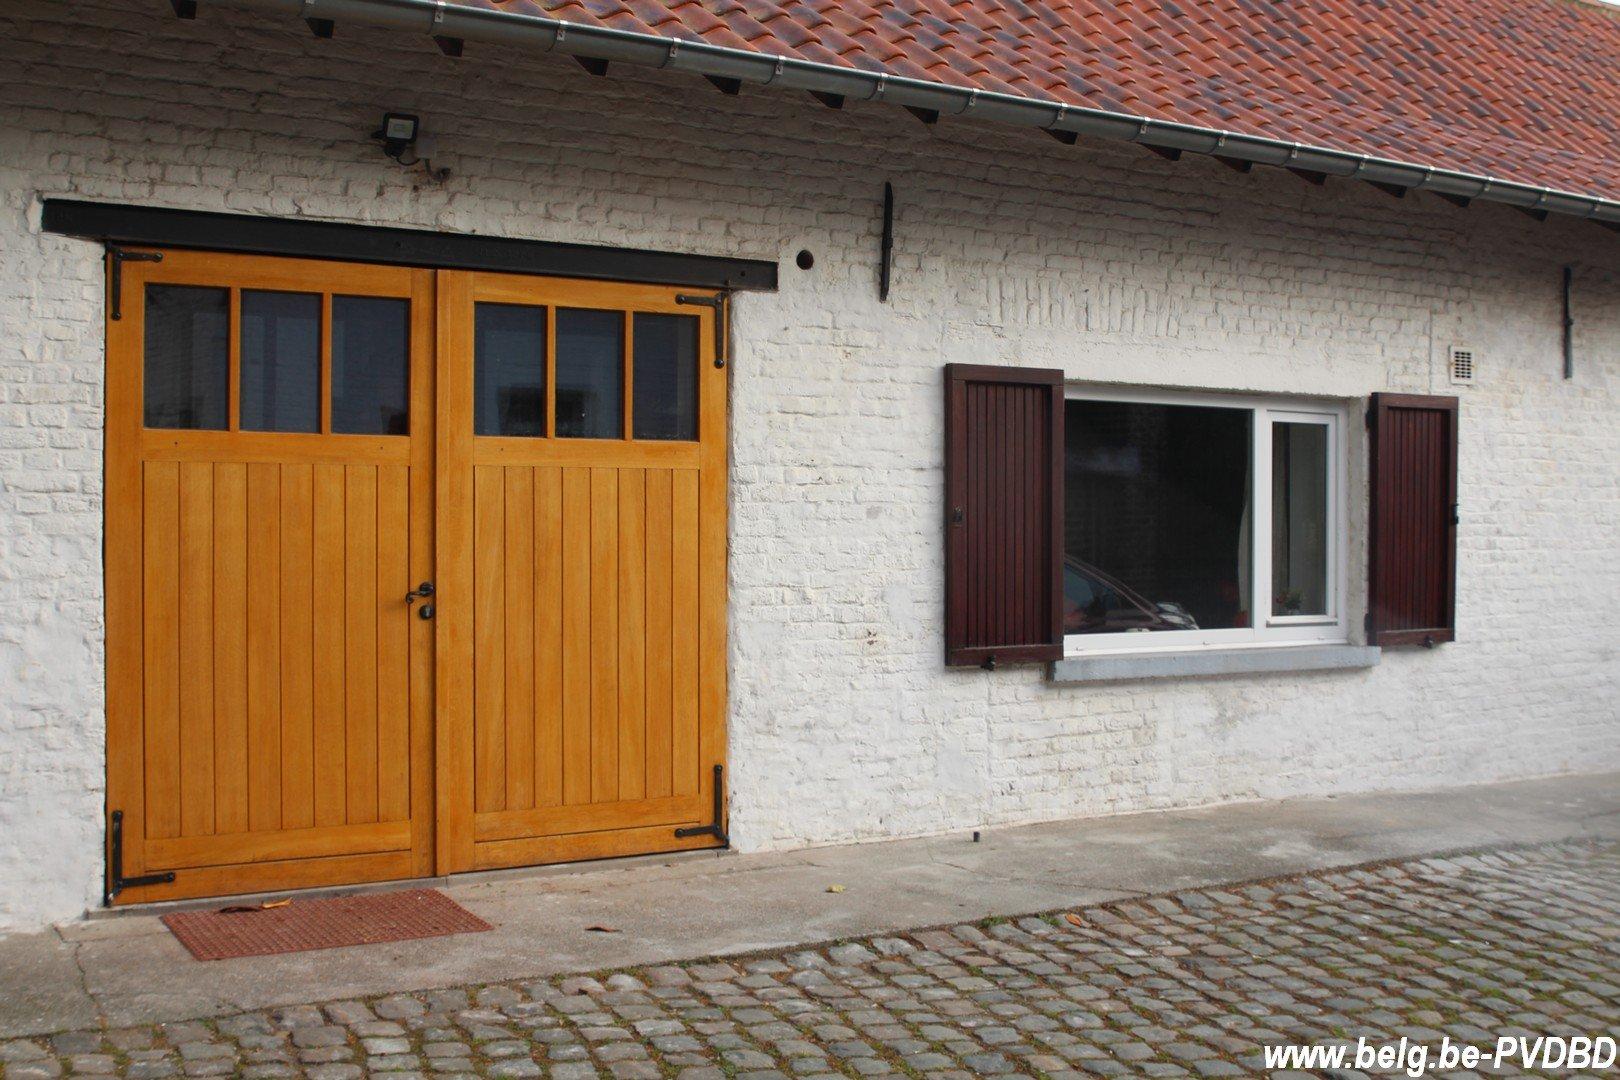 Bodegems parochiesecretariaat in ere hersteld - IMG 2754